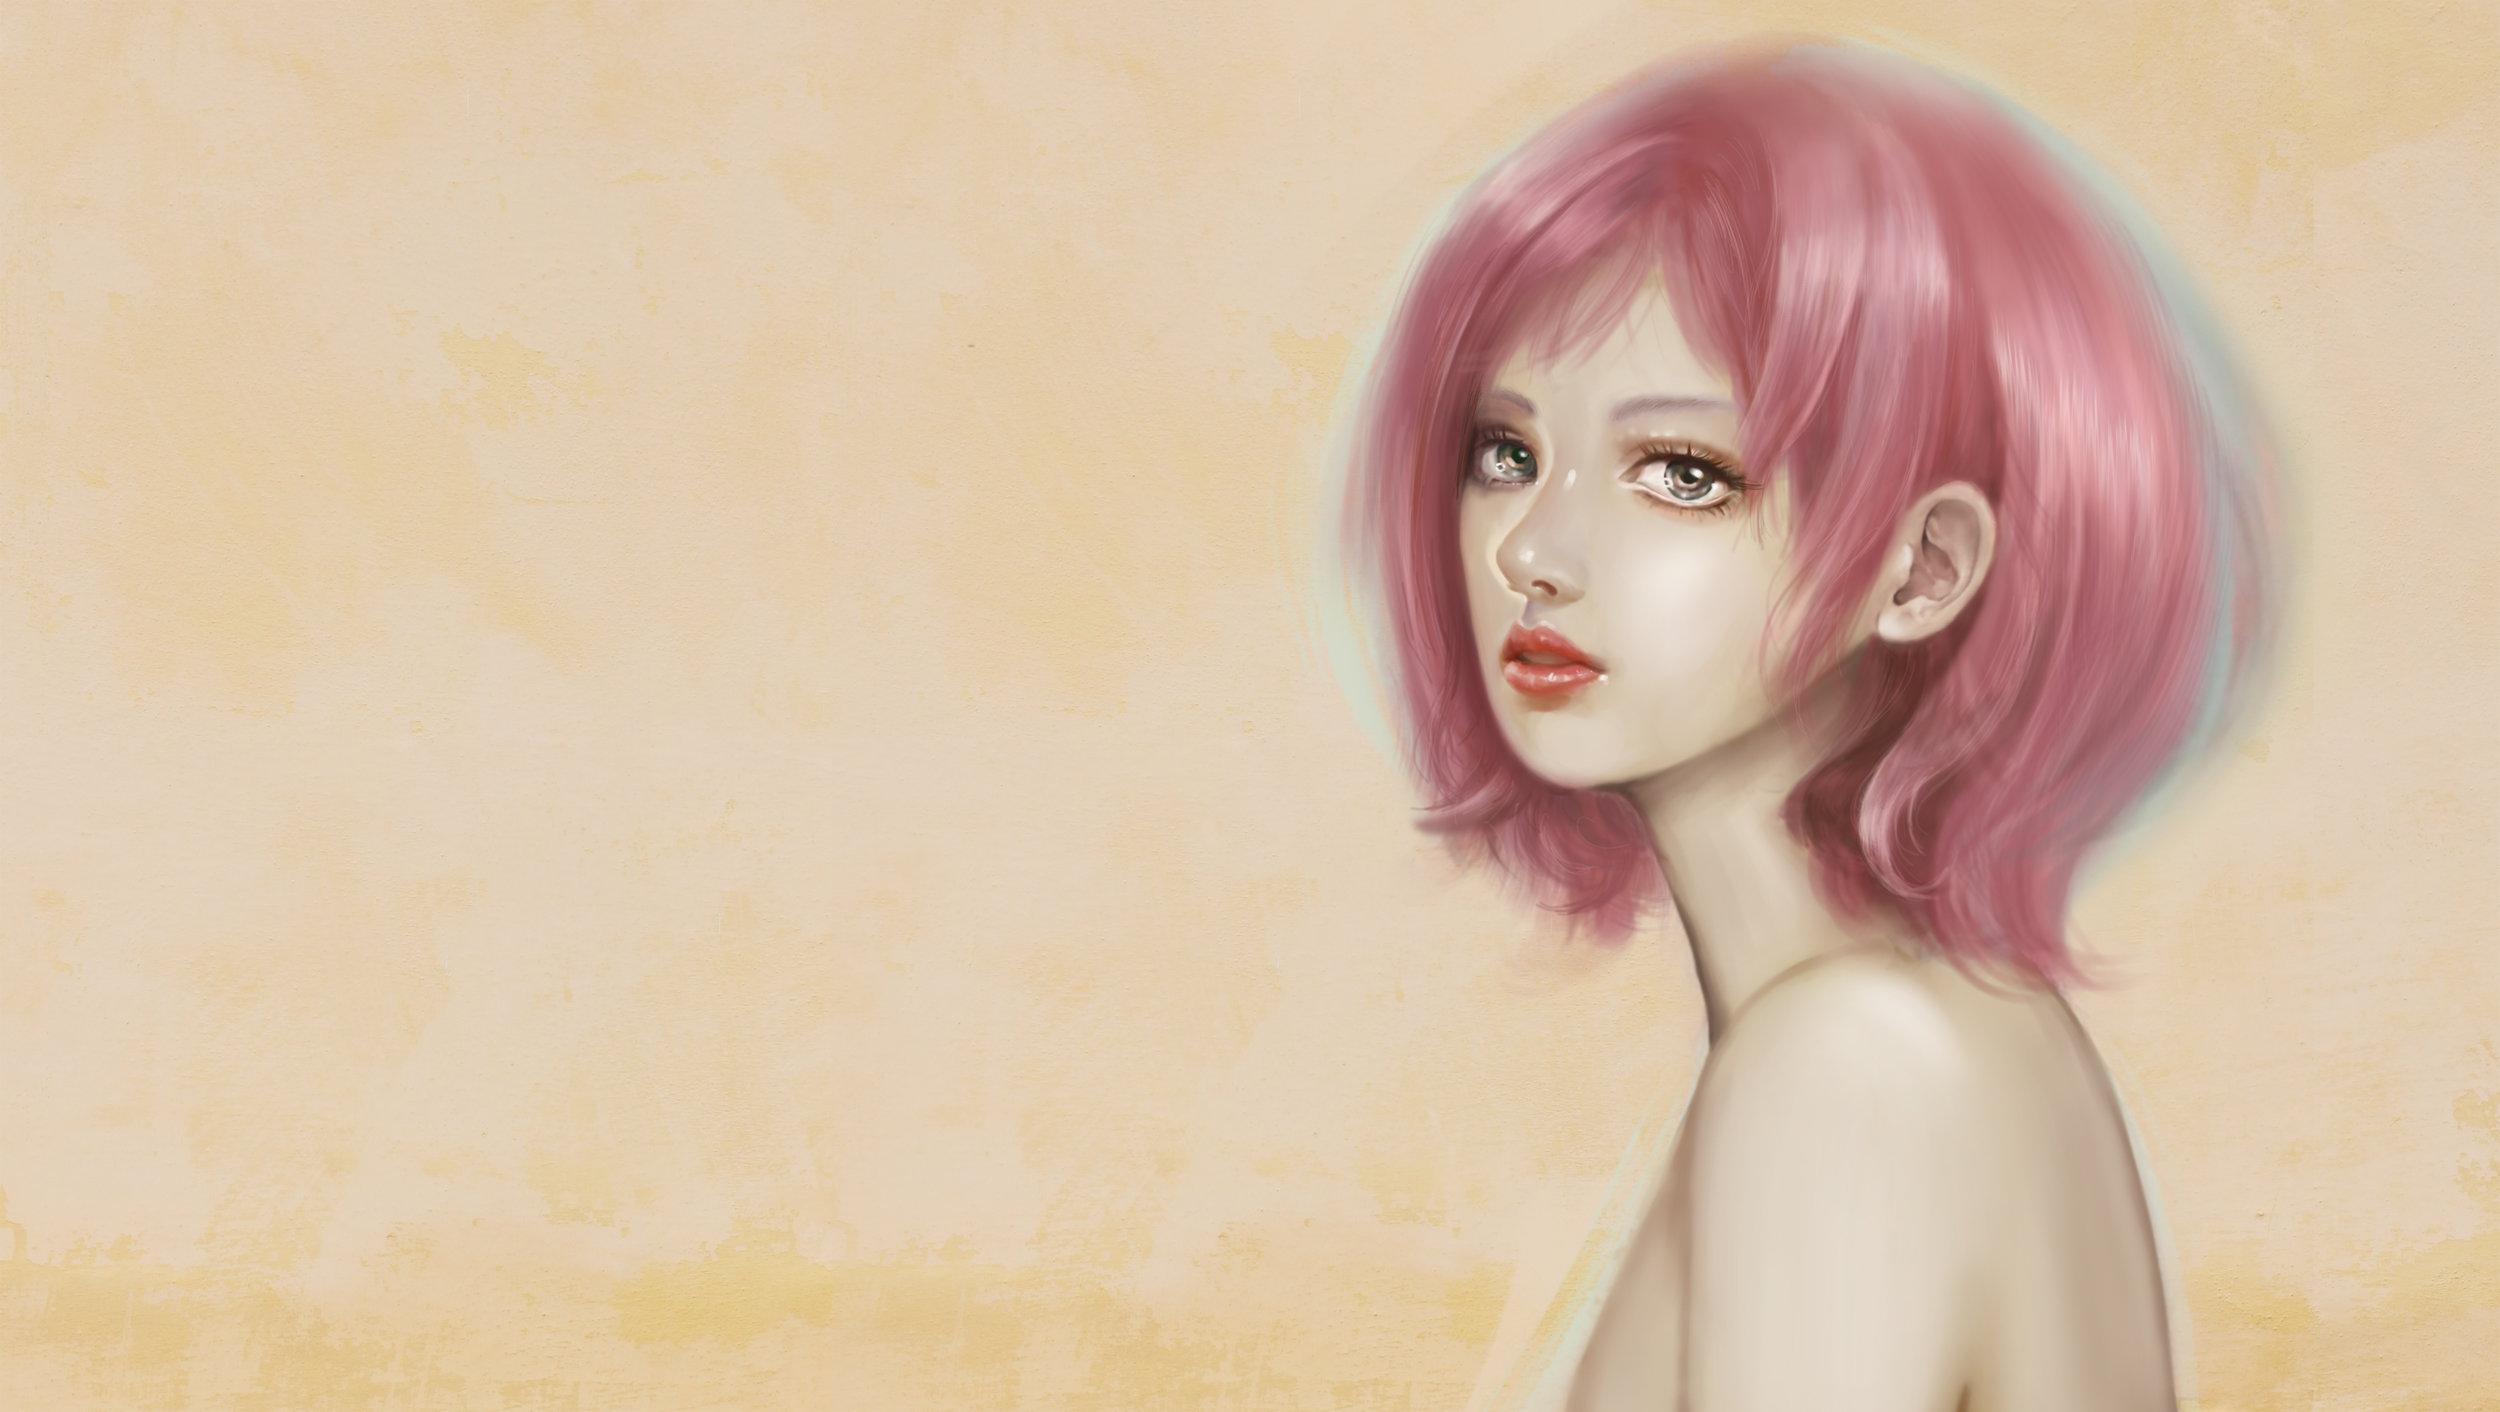 df031c5bab9fbe5819be98bb86e38a5b--girl-face-woman-face.jpg